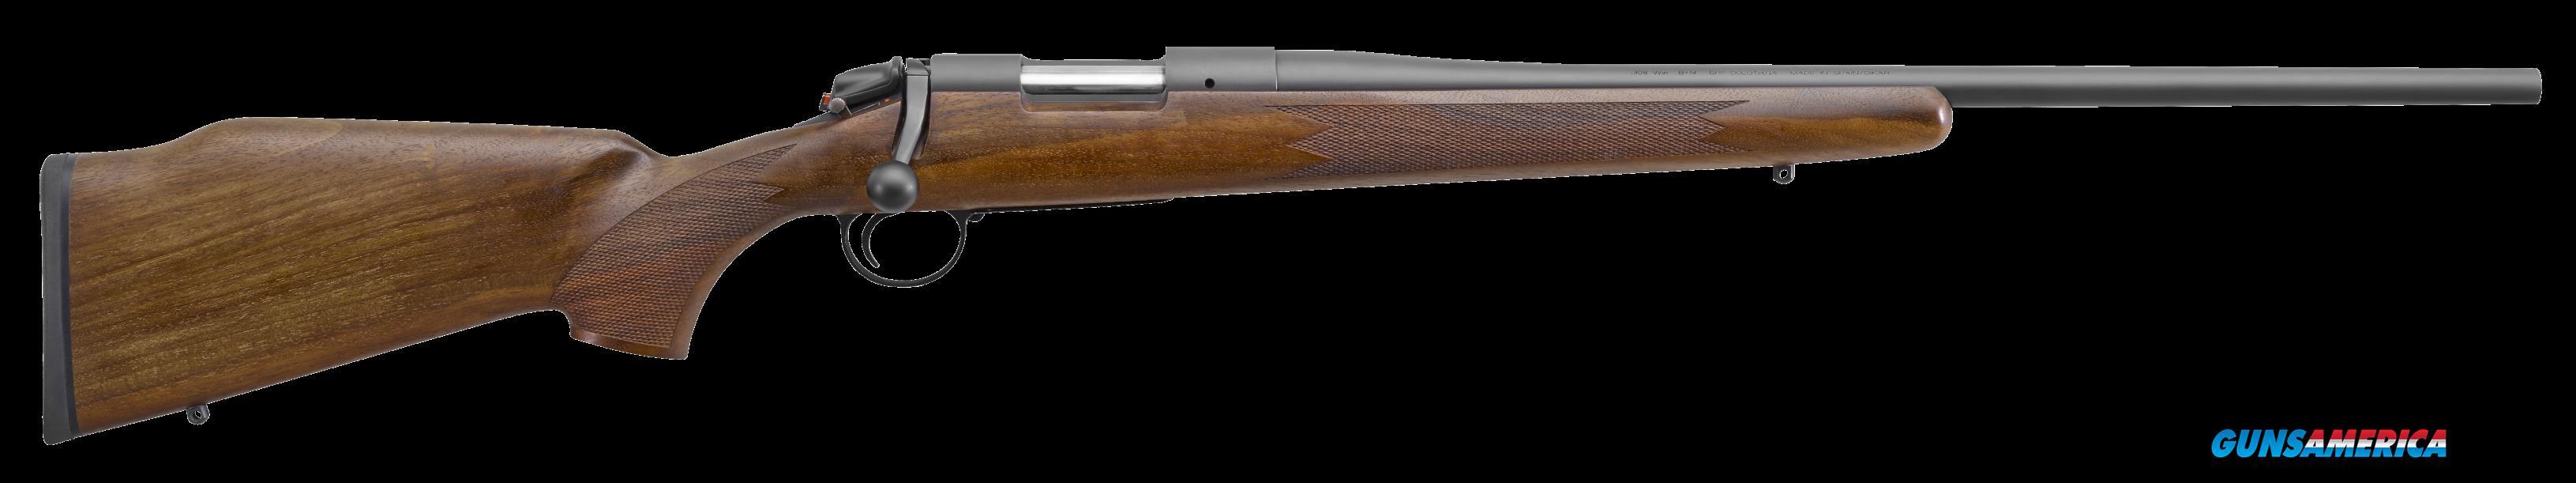 Bergara Rifles B-14, Bergara B14l002       270     Timber      Wal  Guns > Pistols > 1911 Pistol Copies (non-Colt)